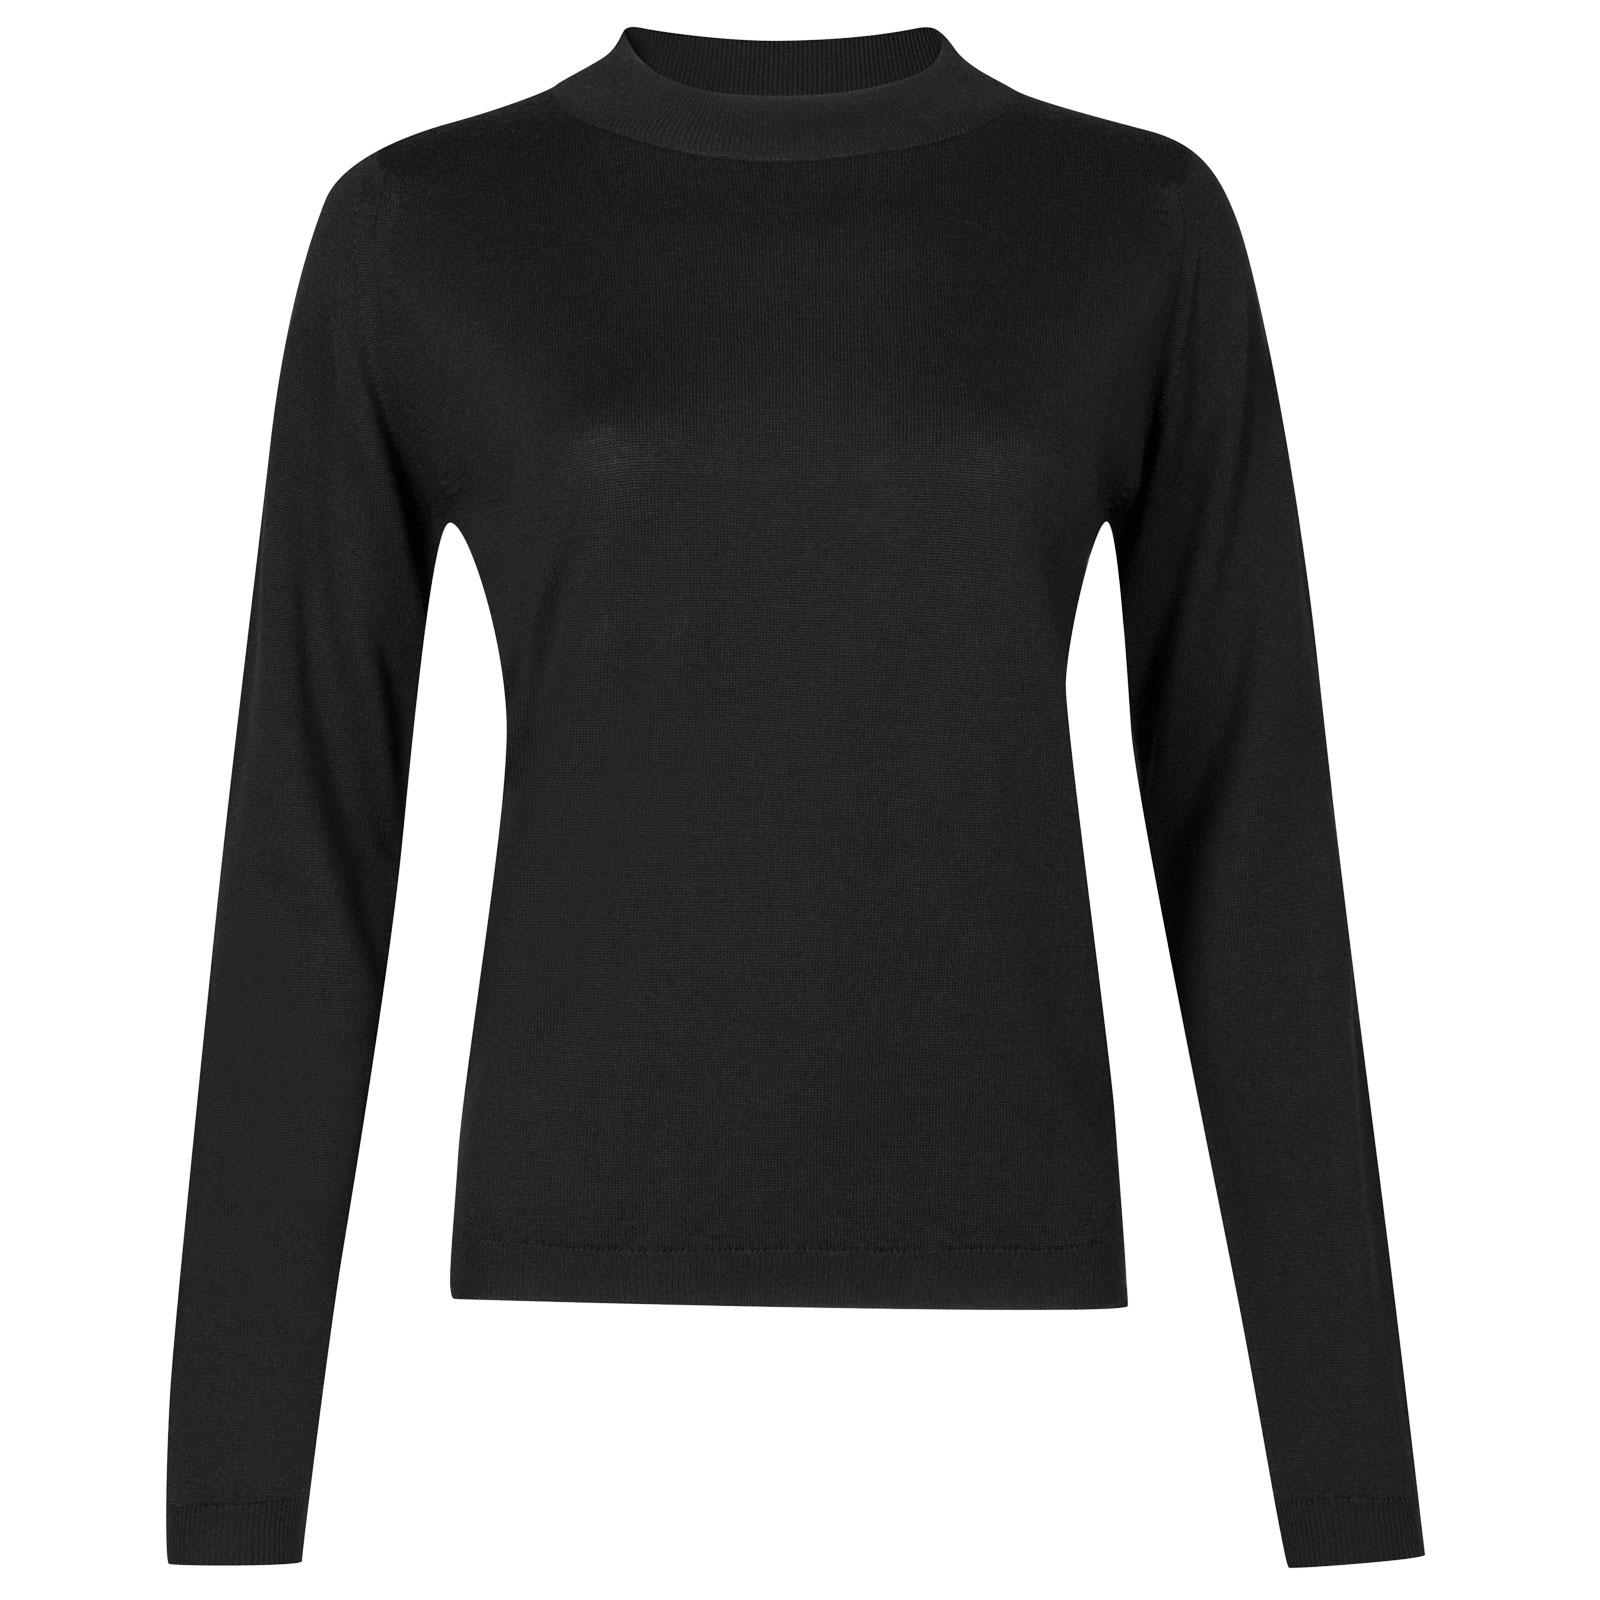 John Smedley renata Merino Wool Sweater in Black-M